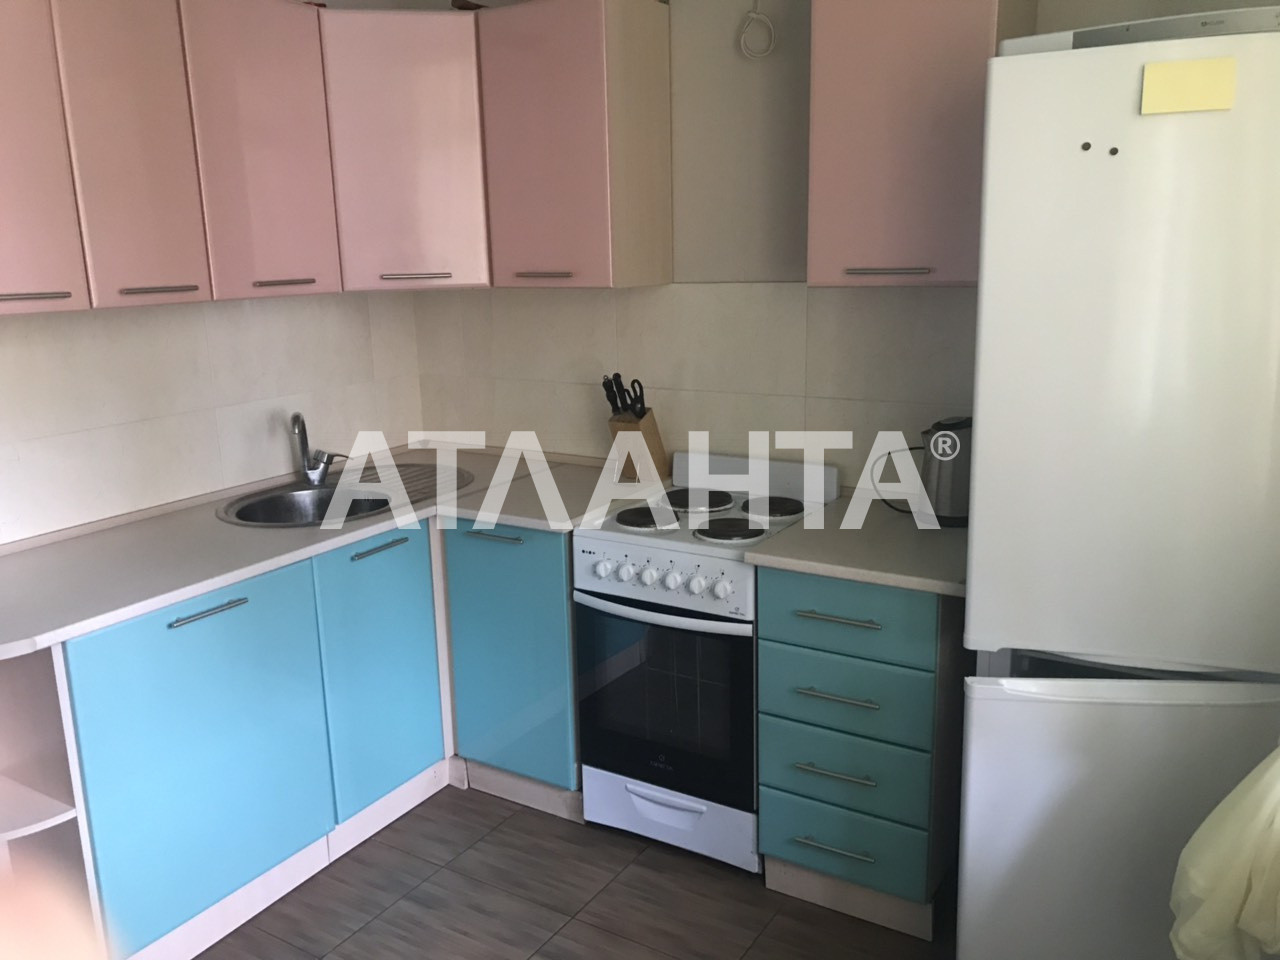 Продается 1-комнатная Квартира на ул. Радужный М-Н — 36 500 у.е. (фото №2)